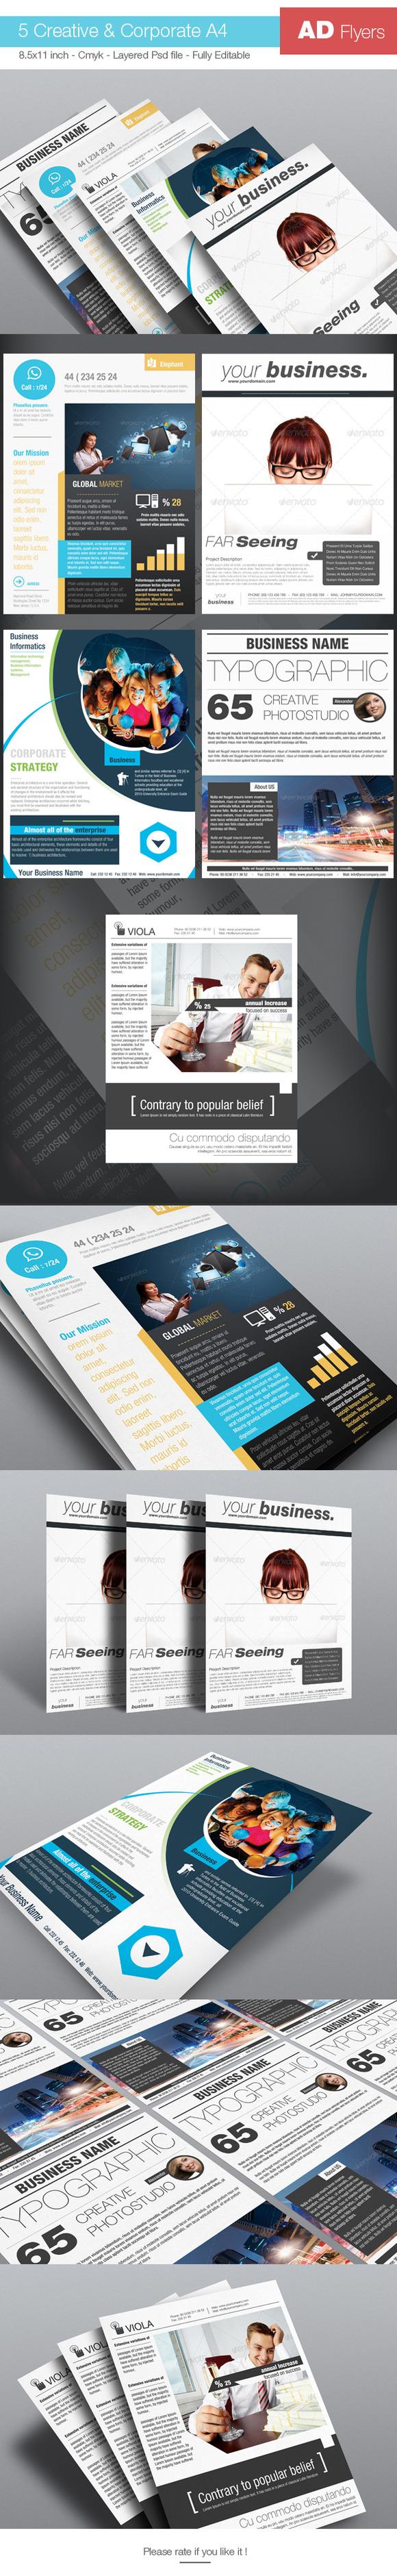 5 Creative AD Flyer BUNDLE